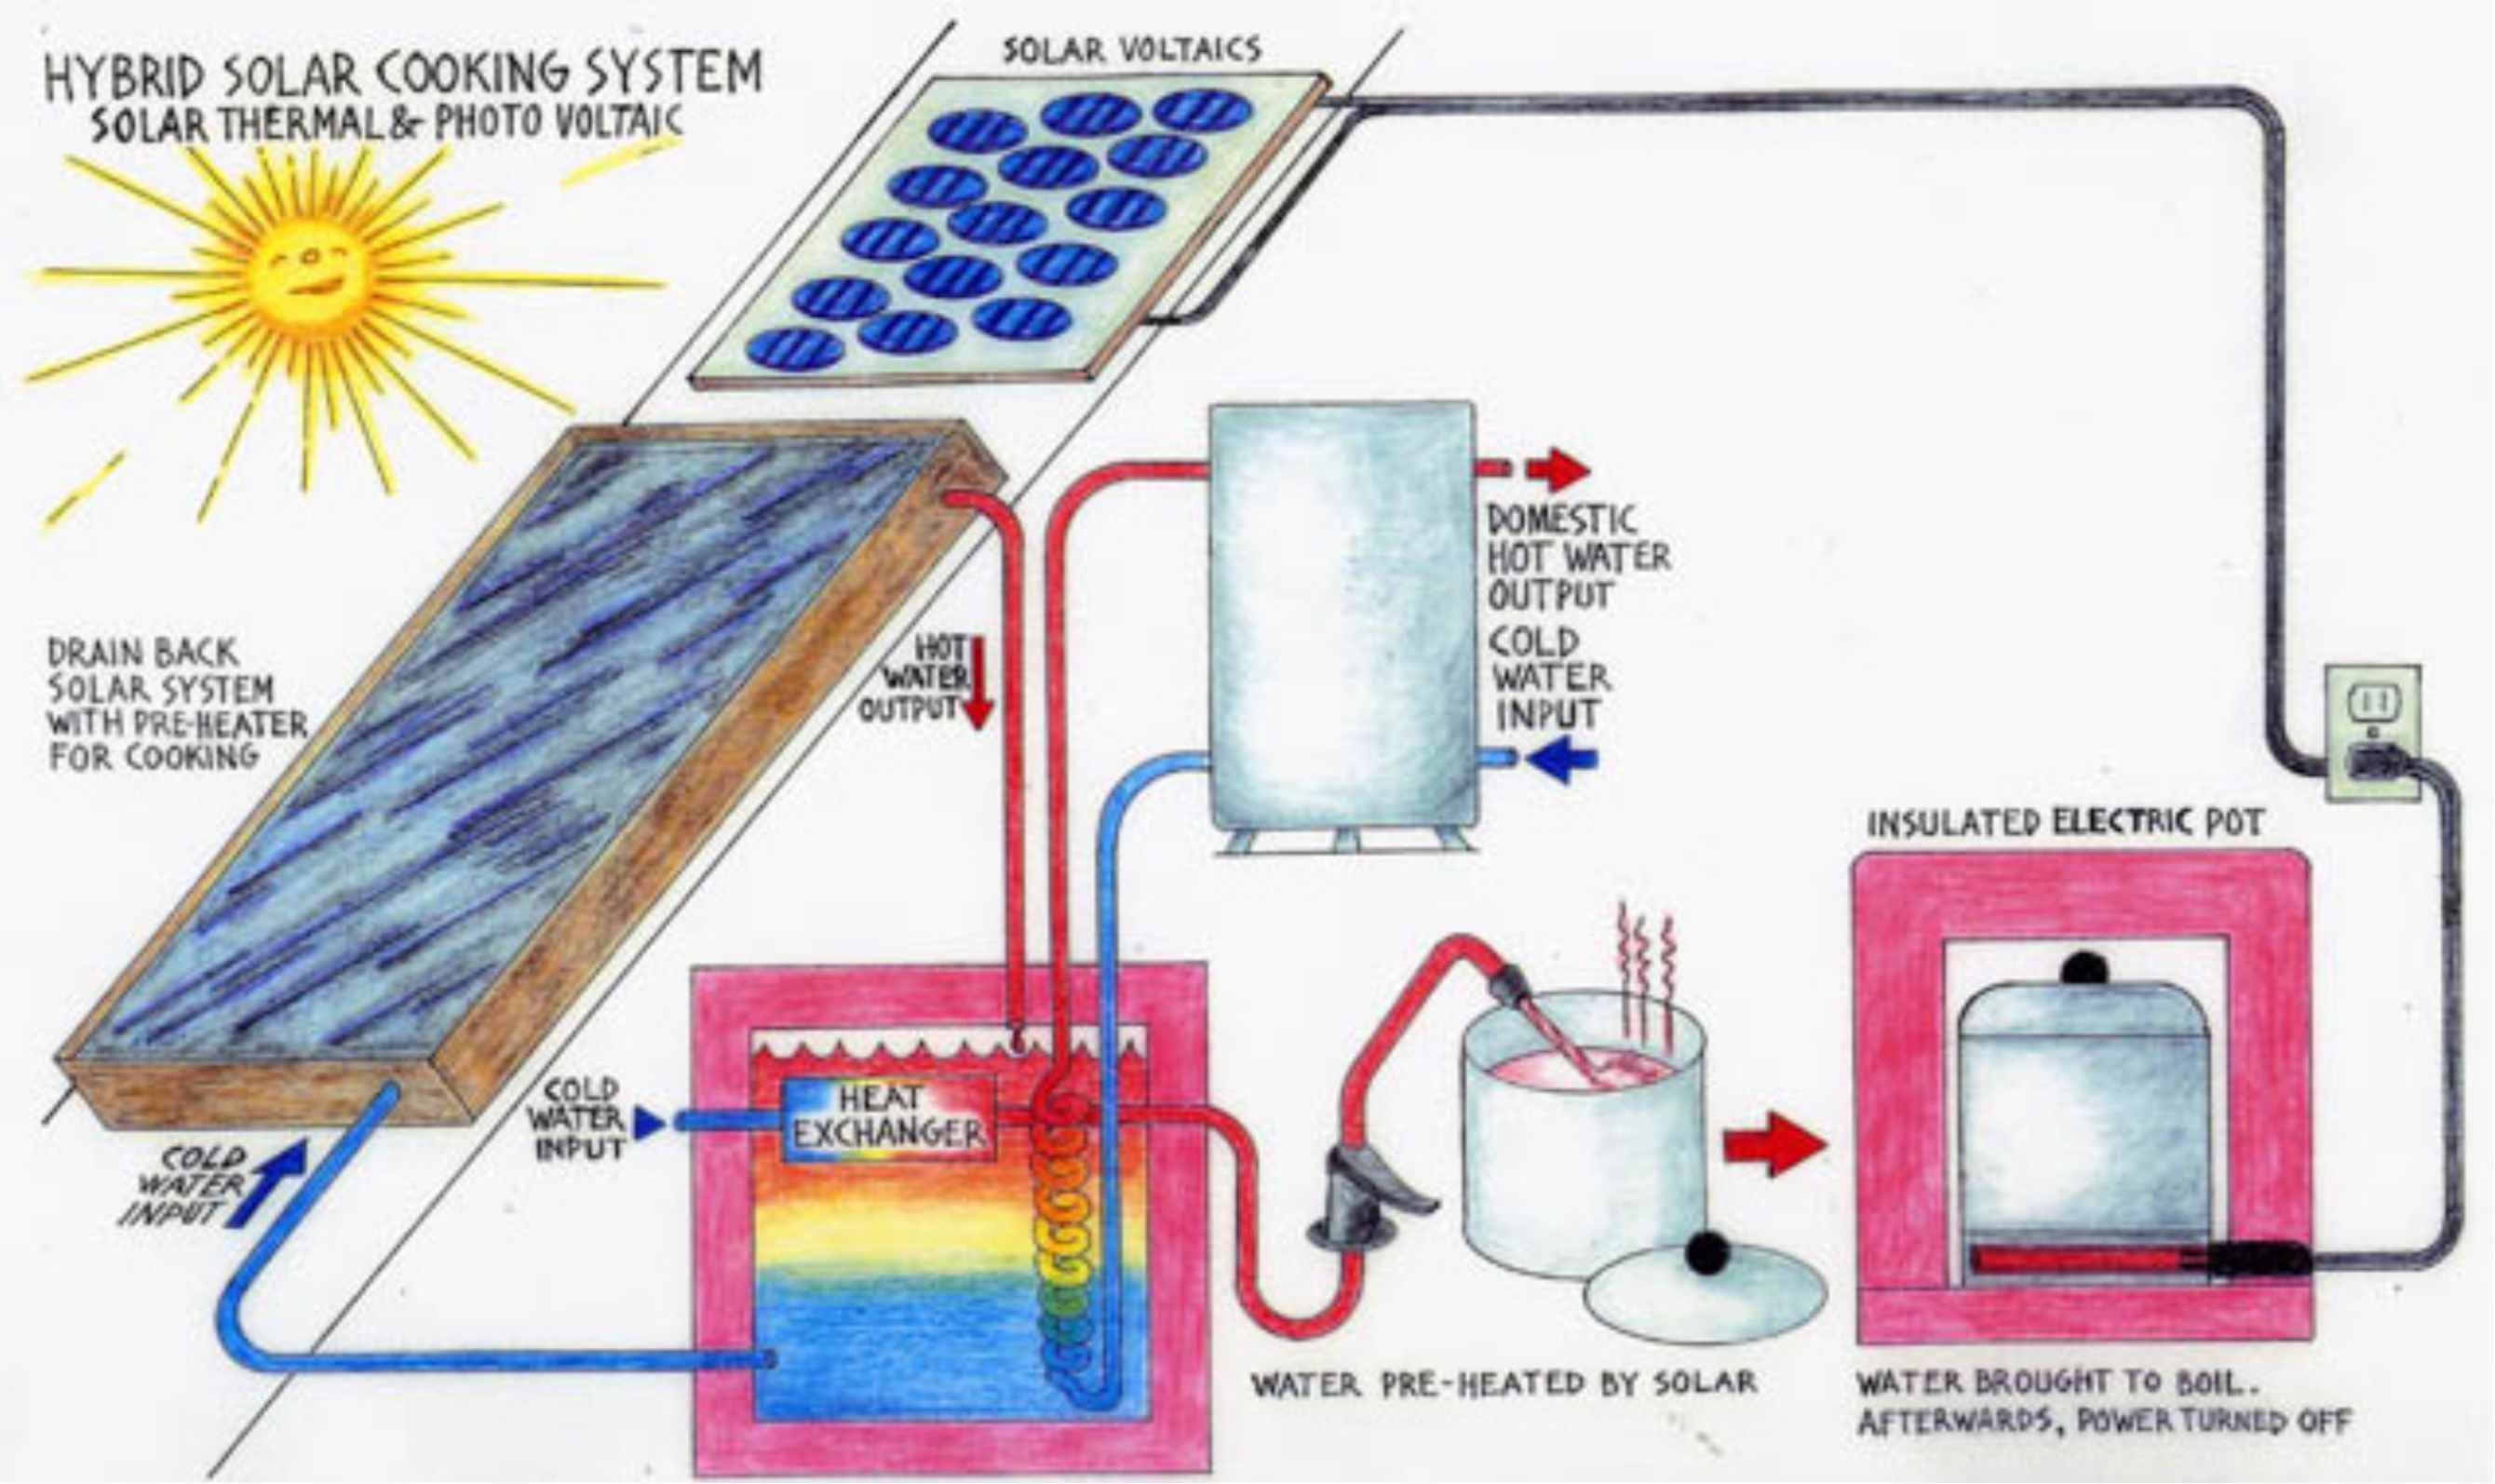 Solar Hybrid Cooking